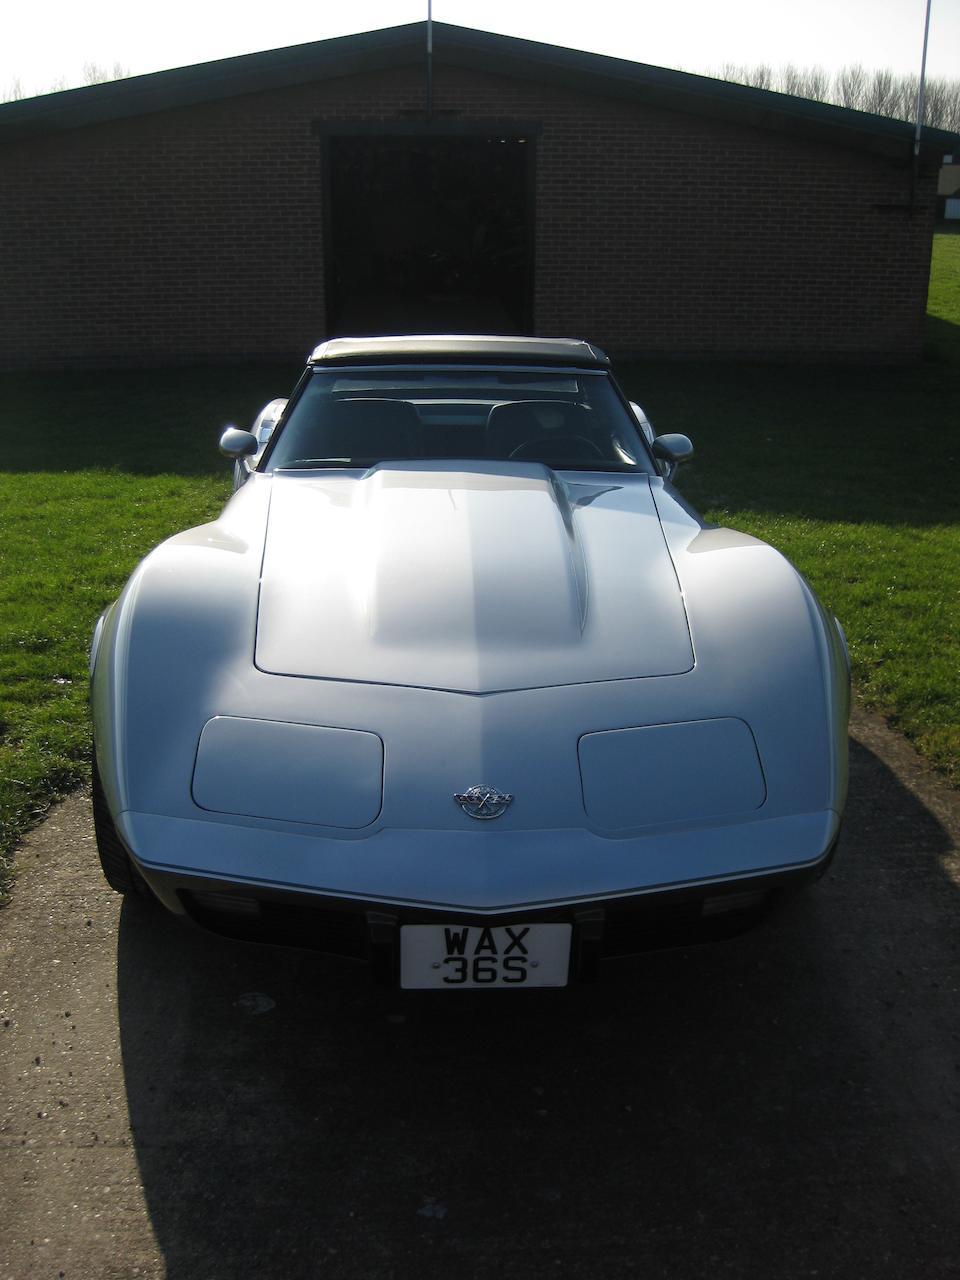 1978 Chevrolet Corvette 'Silver Anniversary' Convertible  Chassis no. 1Z87L8S433552 Engine no. V0627CUT185433552